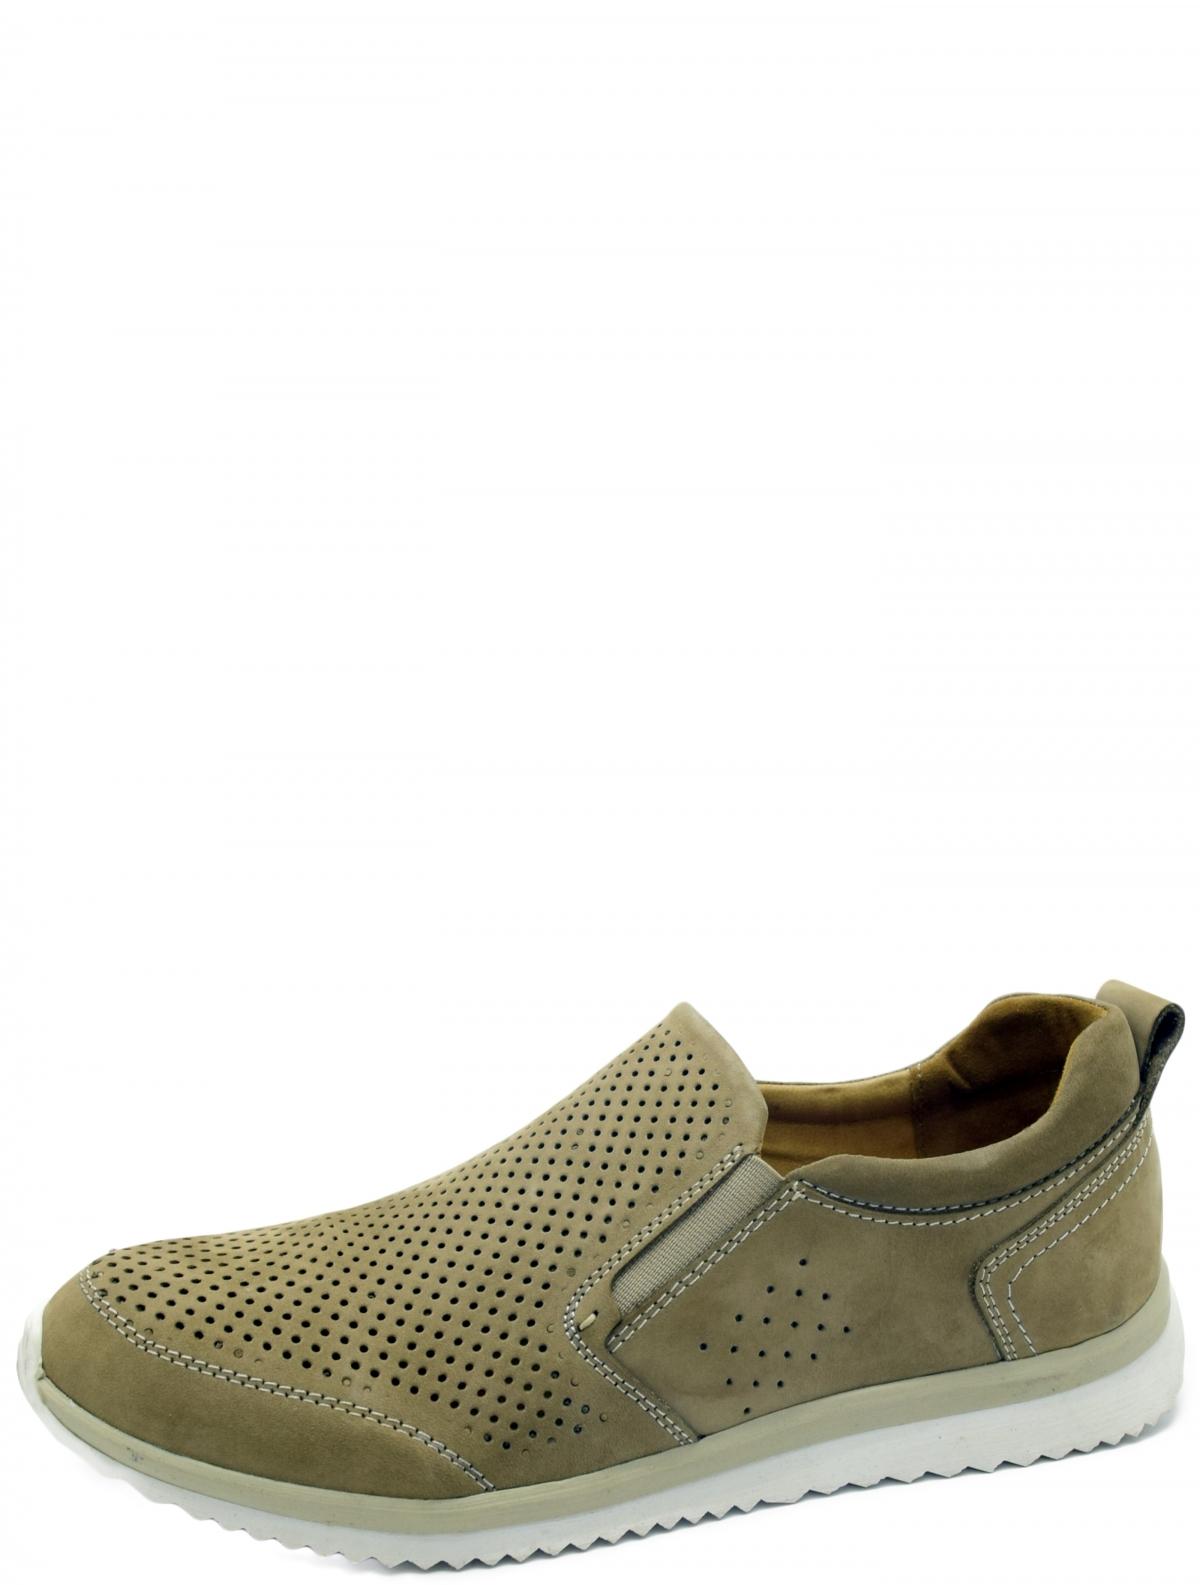 Bossner 1-463-300-5 мужские туфли